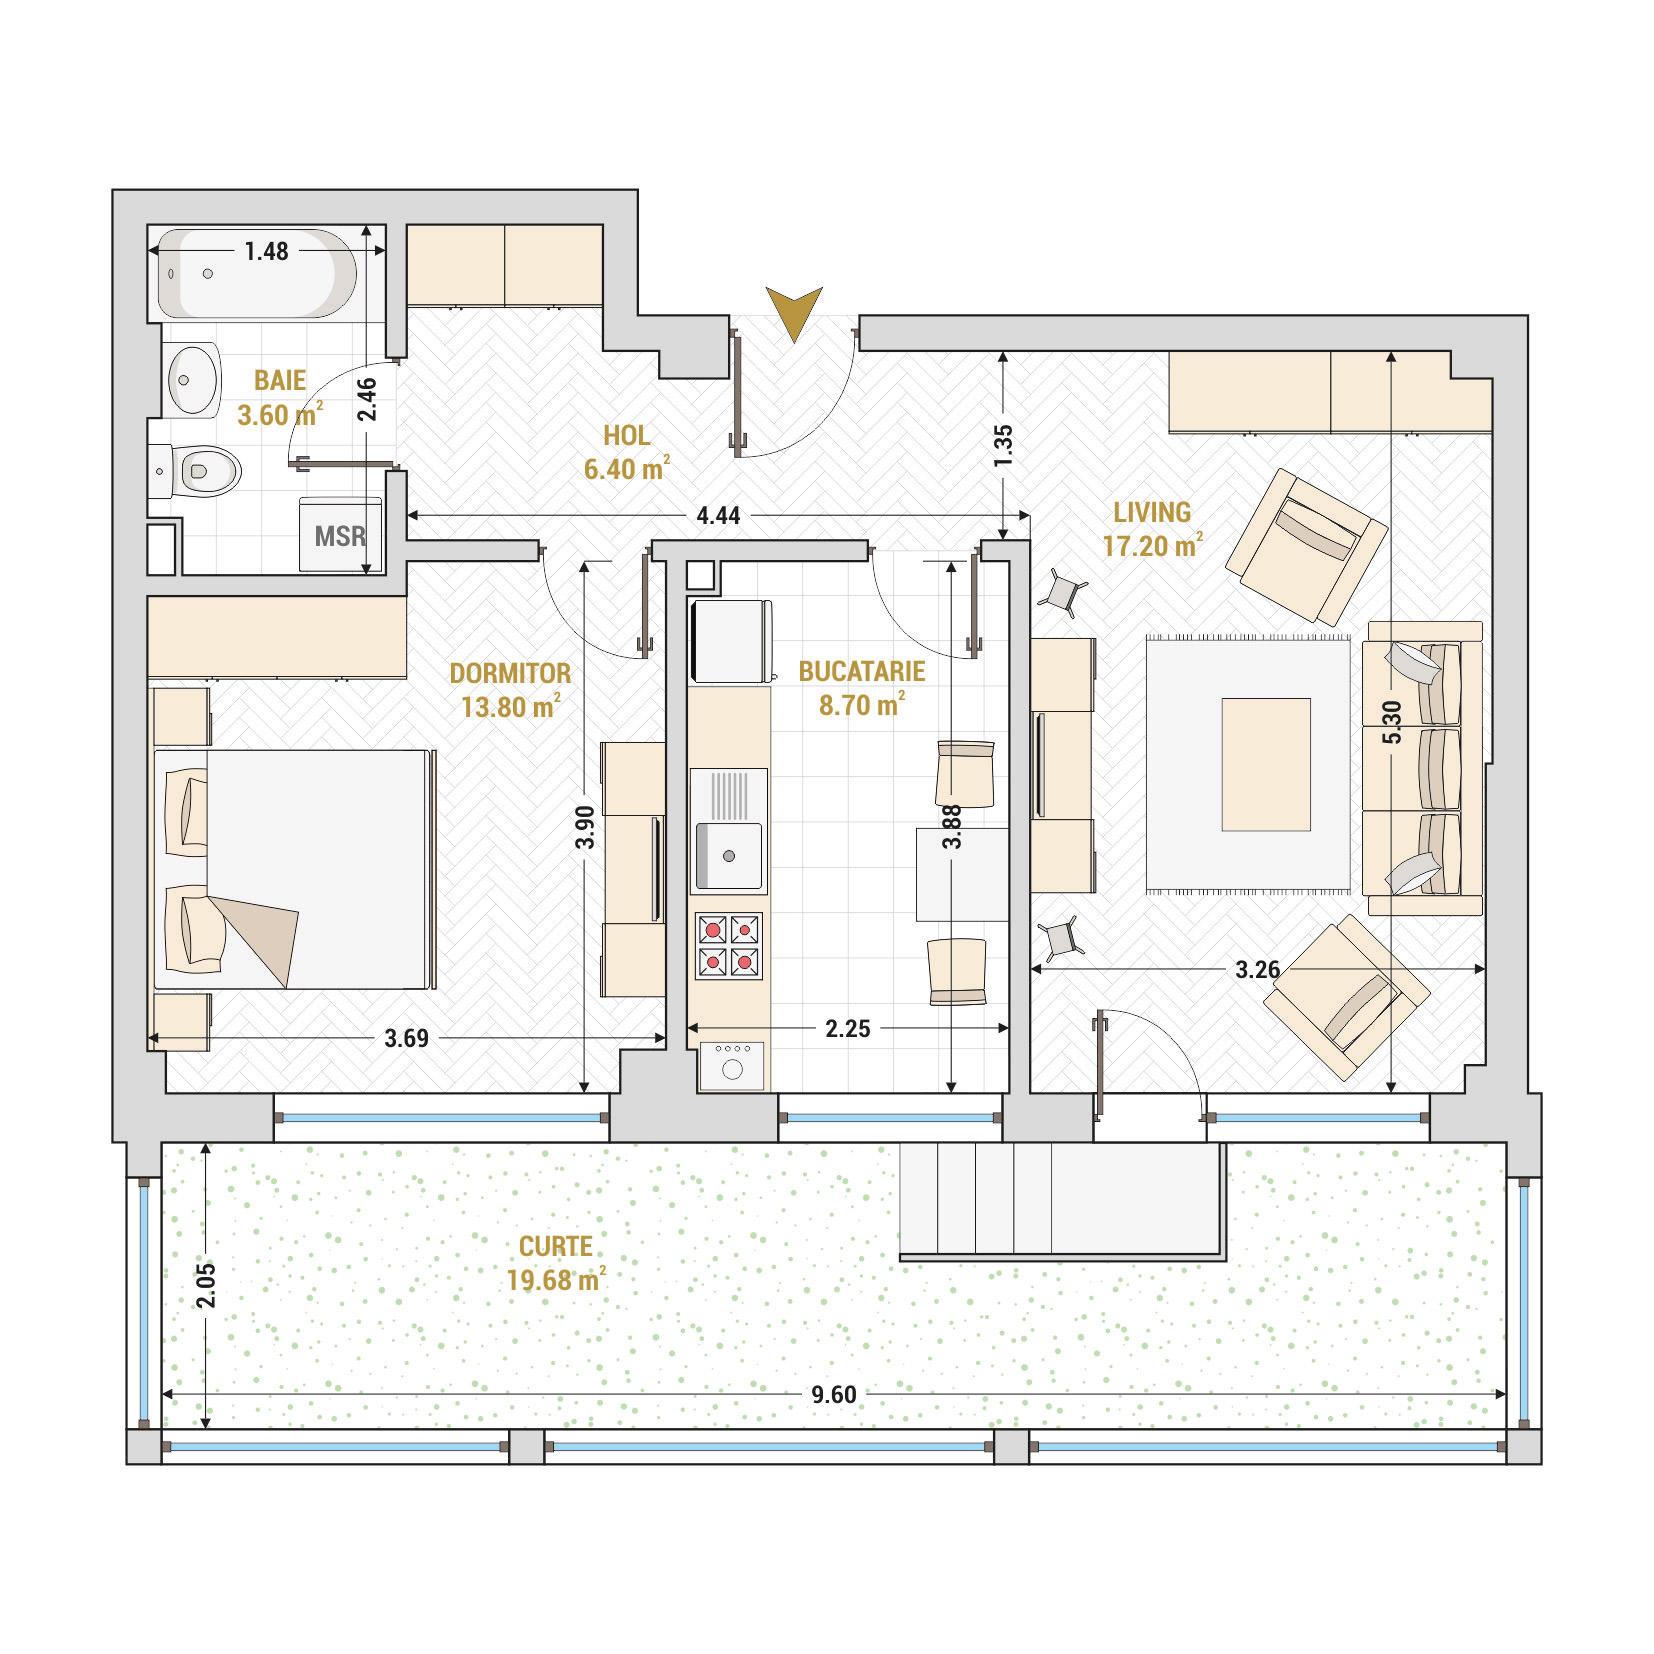 Apartamente cu 2 camere Bucuresti - Catedral Residence - Marriott, Piata Unirii, 13 Septembrie, Izvor - Suprafata utila totala - 69.38 metri patrati